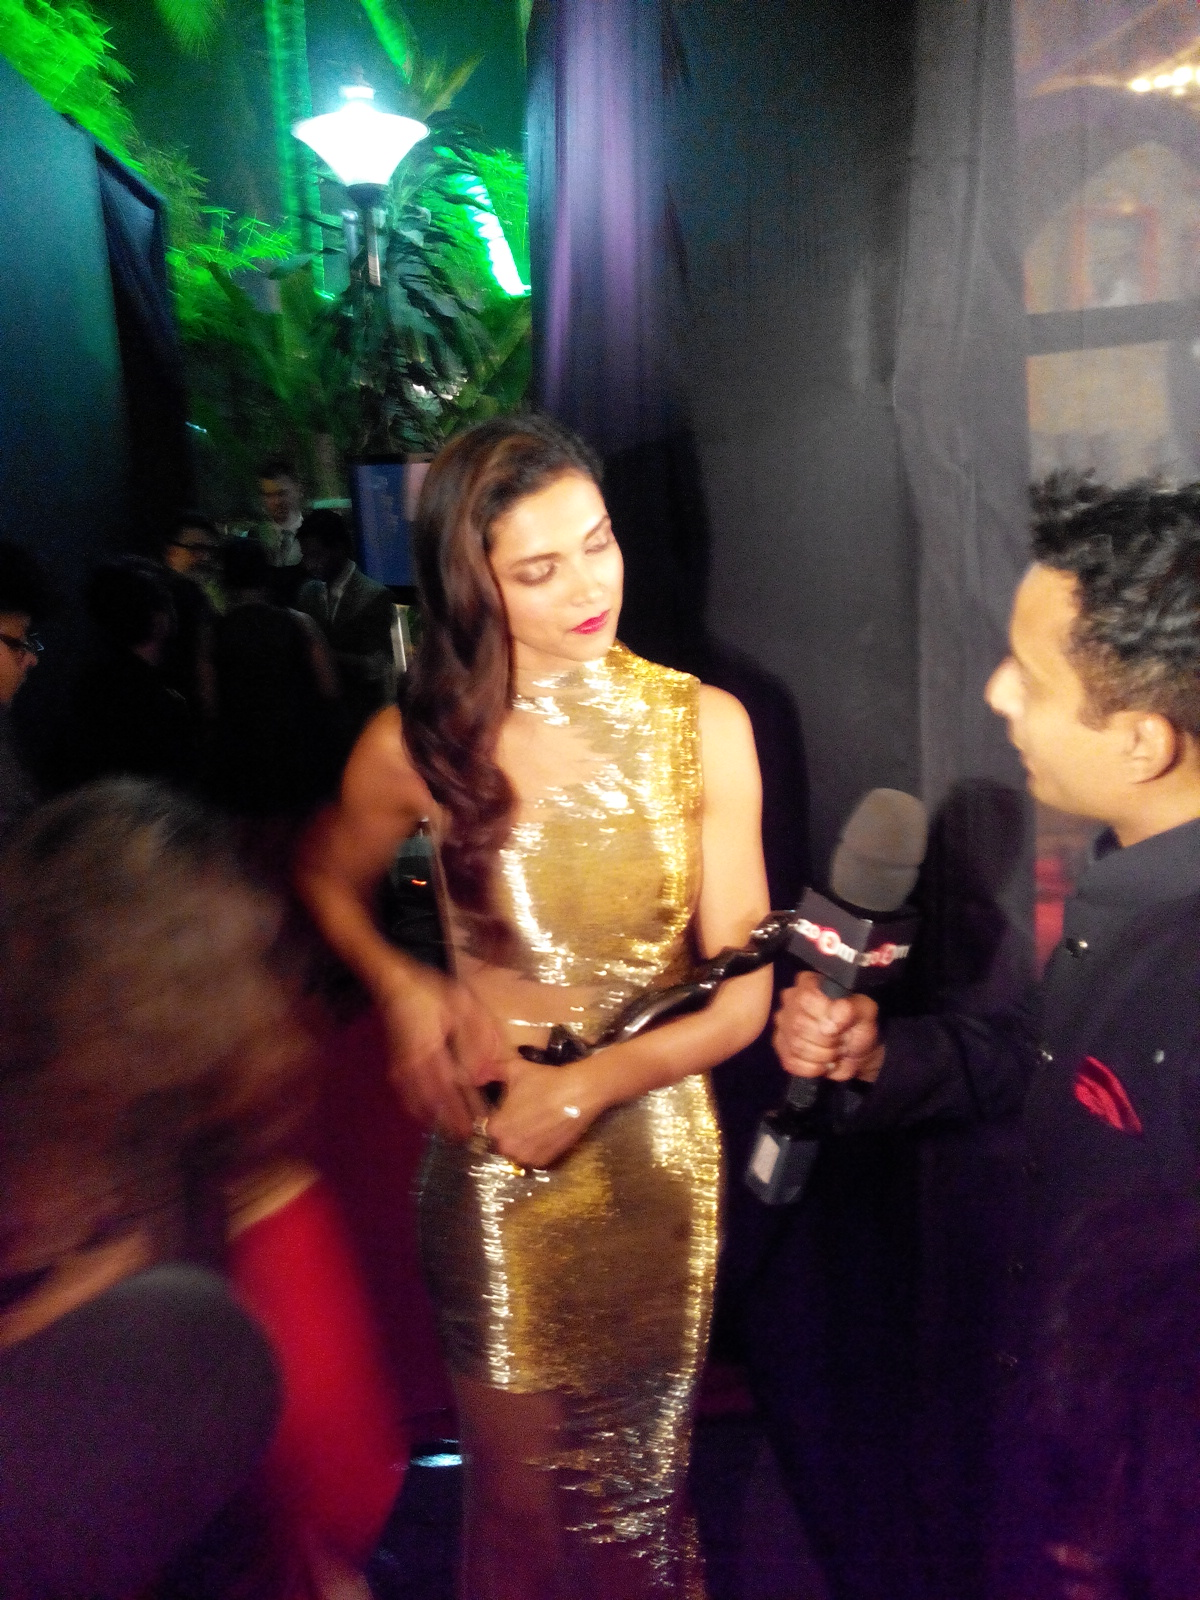 Deepika Padukone after winning the trophy at the 59th Idea Filmfare Awards